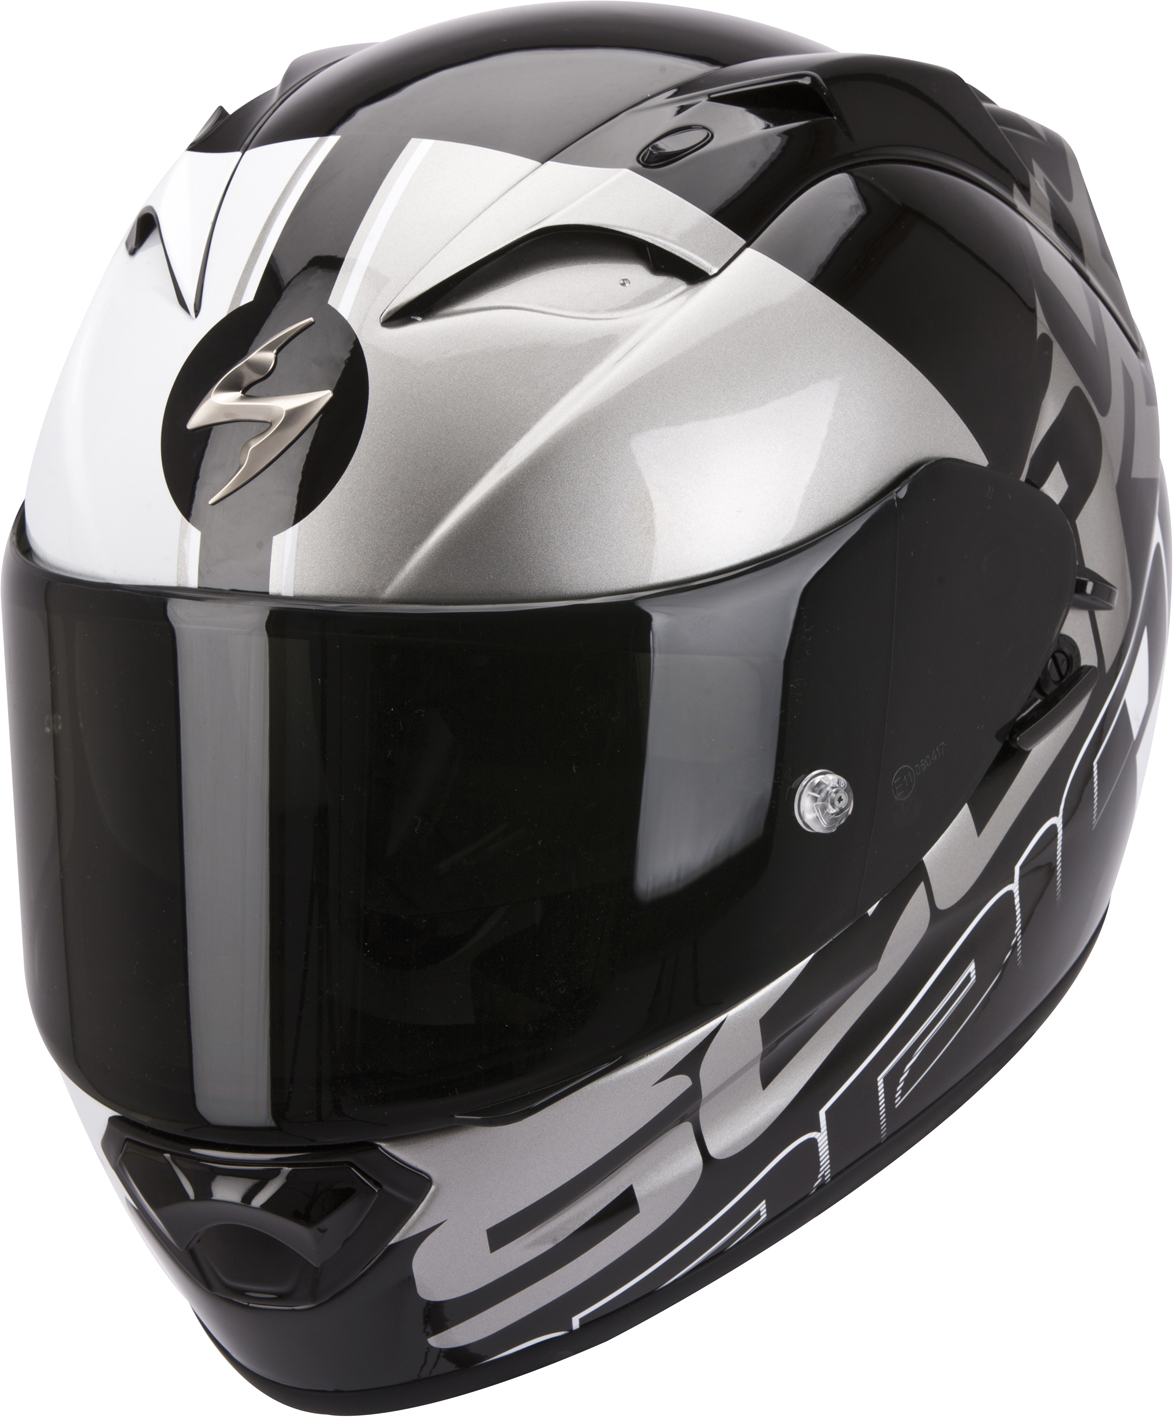 scorpion exo 1200 air quarterback mitico bikes vienna. Black Bedroom Furniture Sets. Home Design Ideas